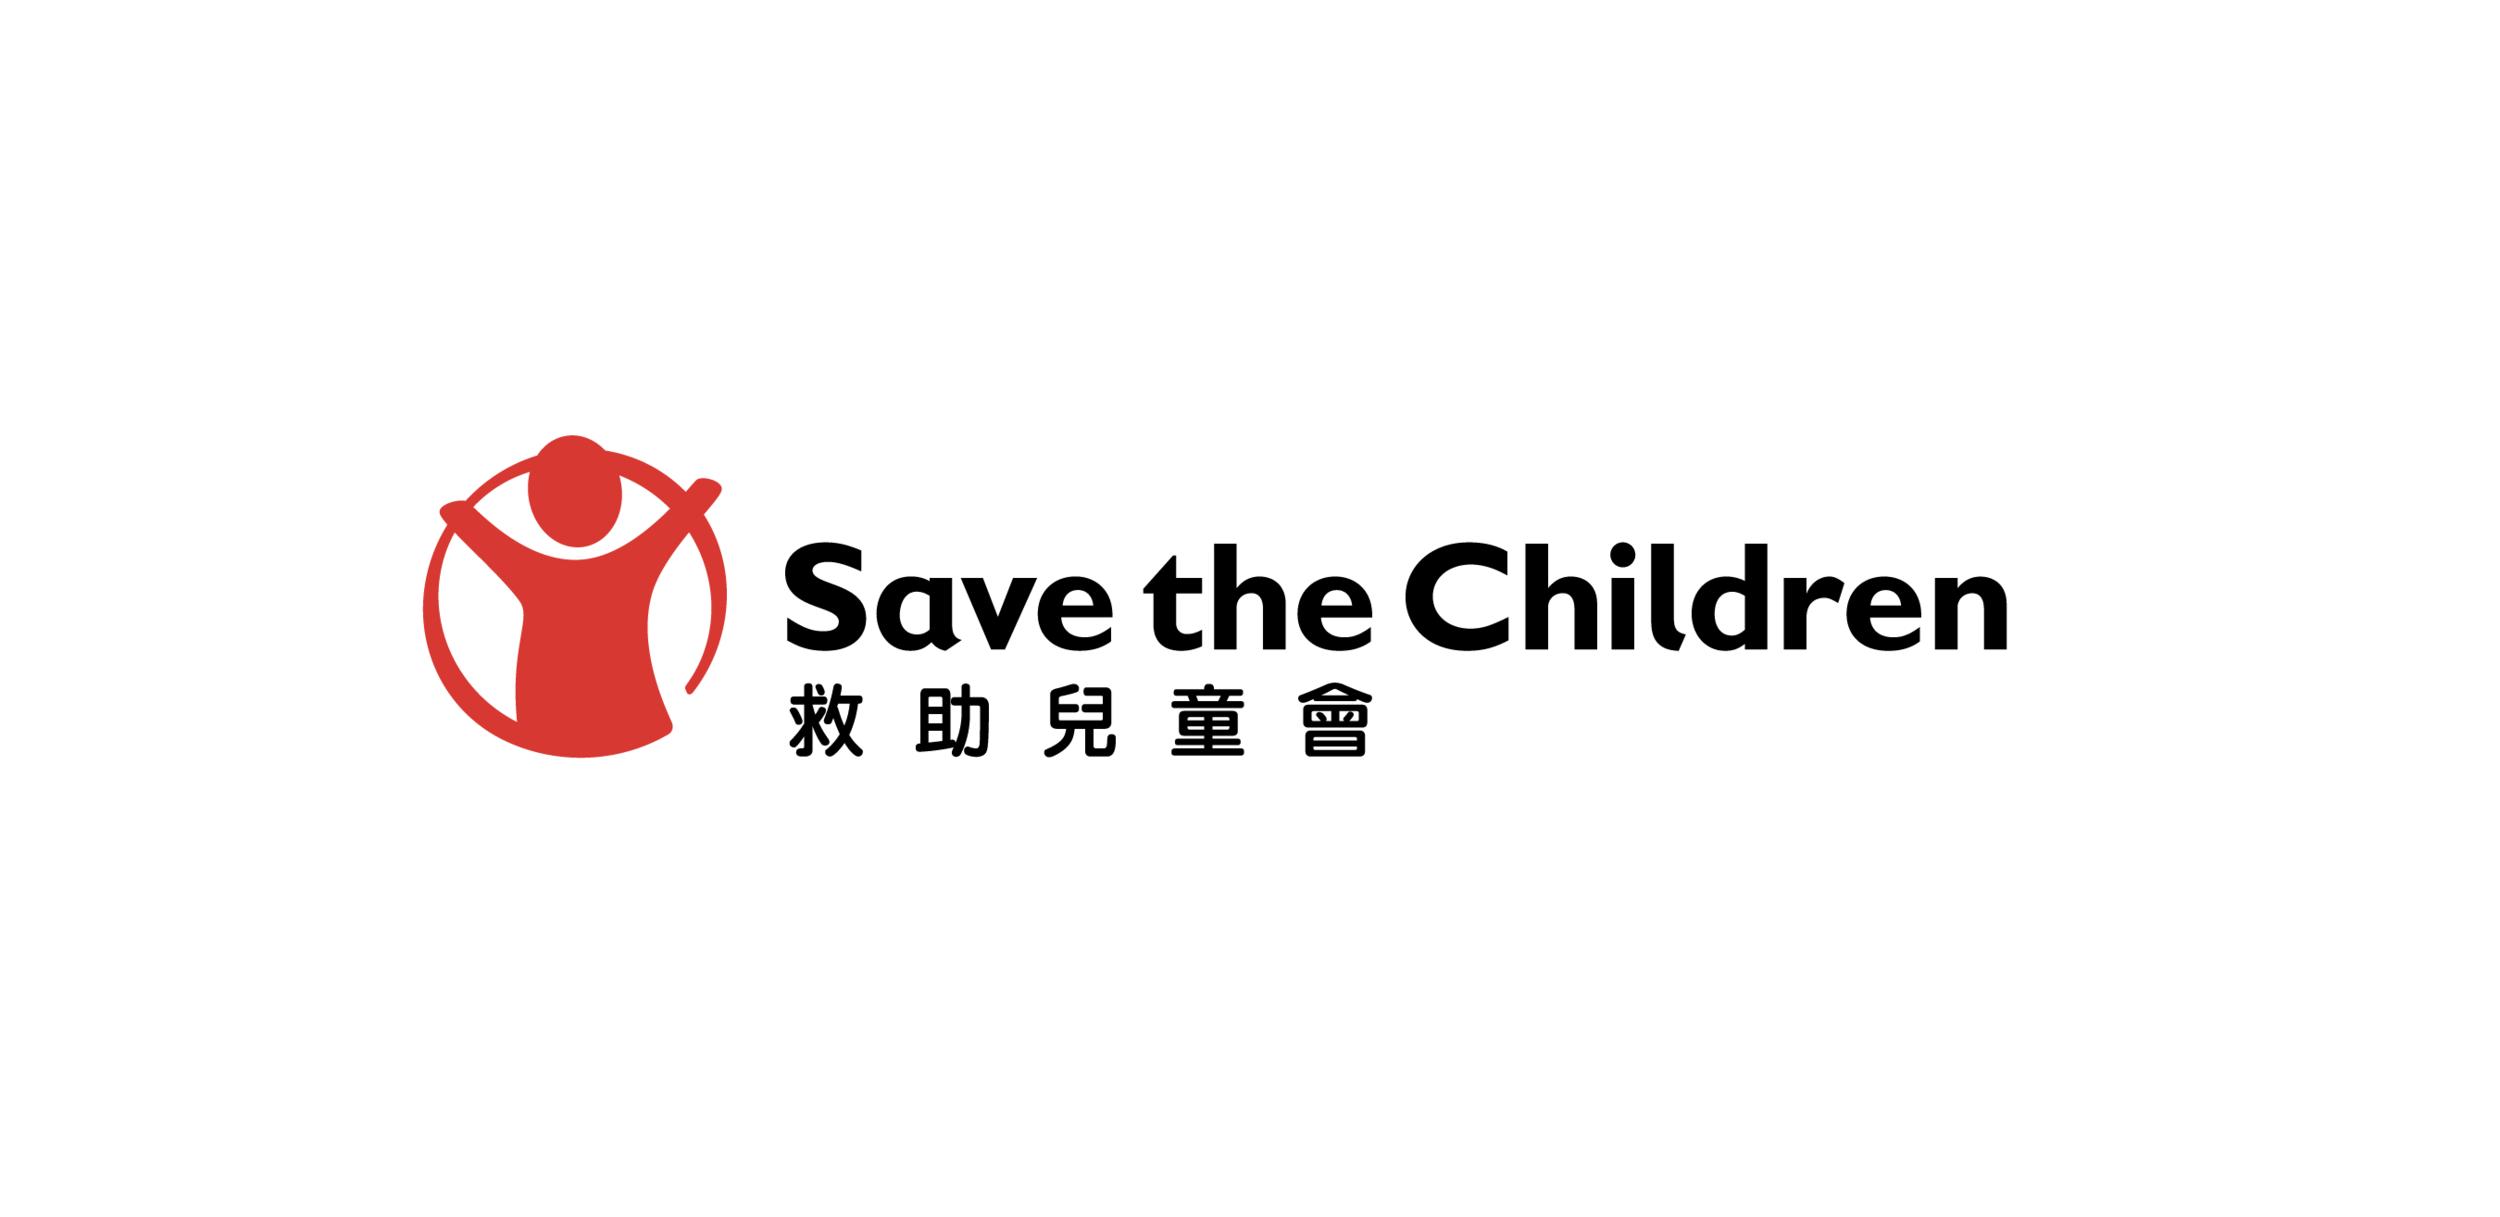 Magnus-&-Novus-x-Save-the-Children.png